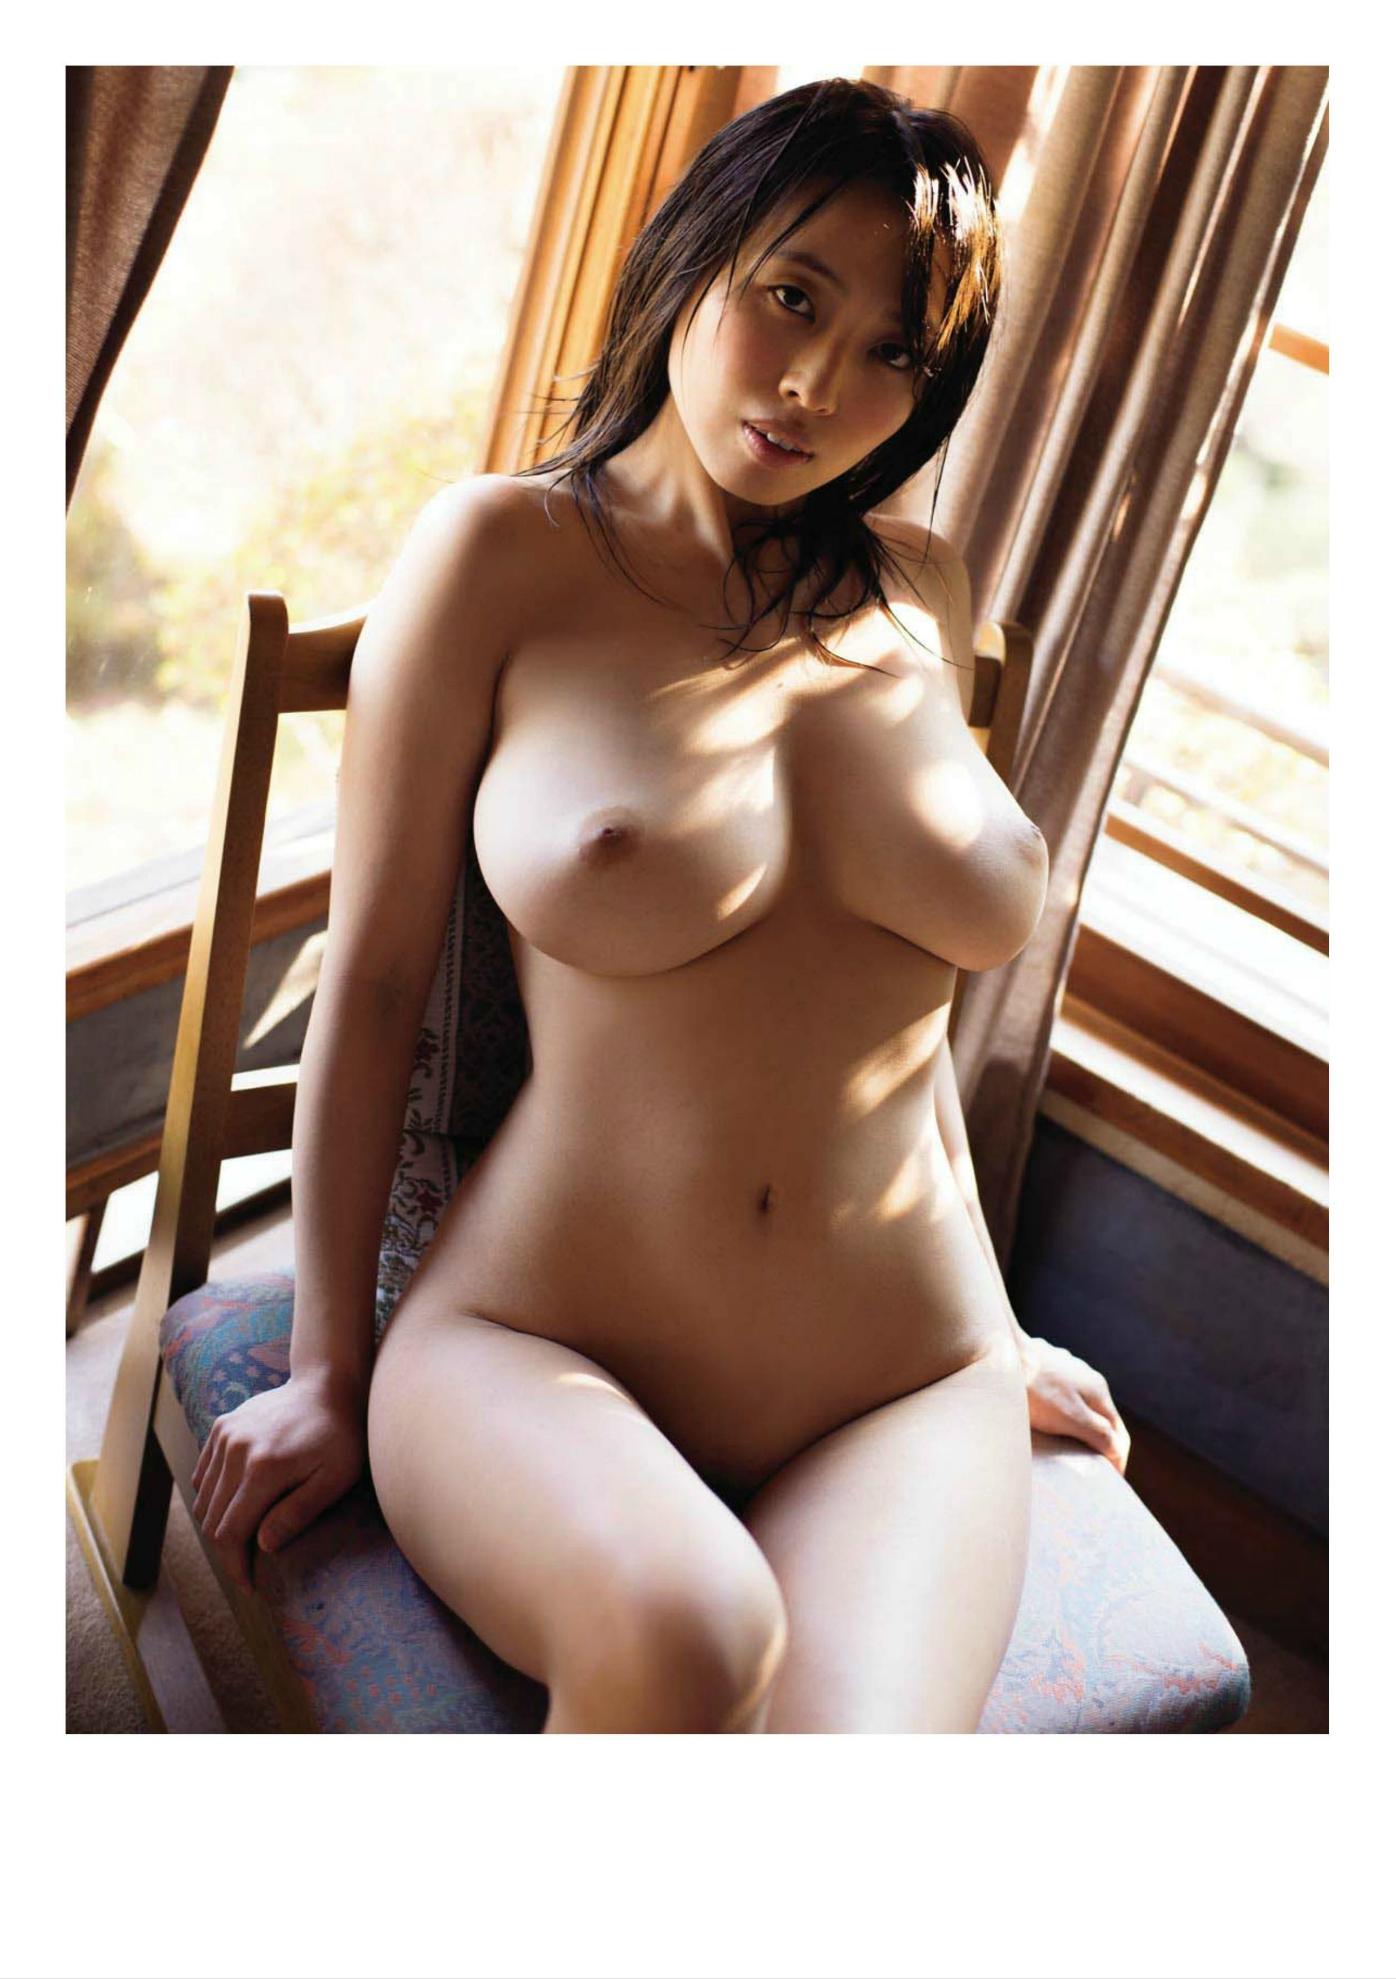 image http://scanlover.com/assets/images/2952-2D7qIFVs4ju2A2CE.jpeg